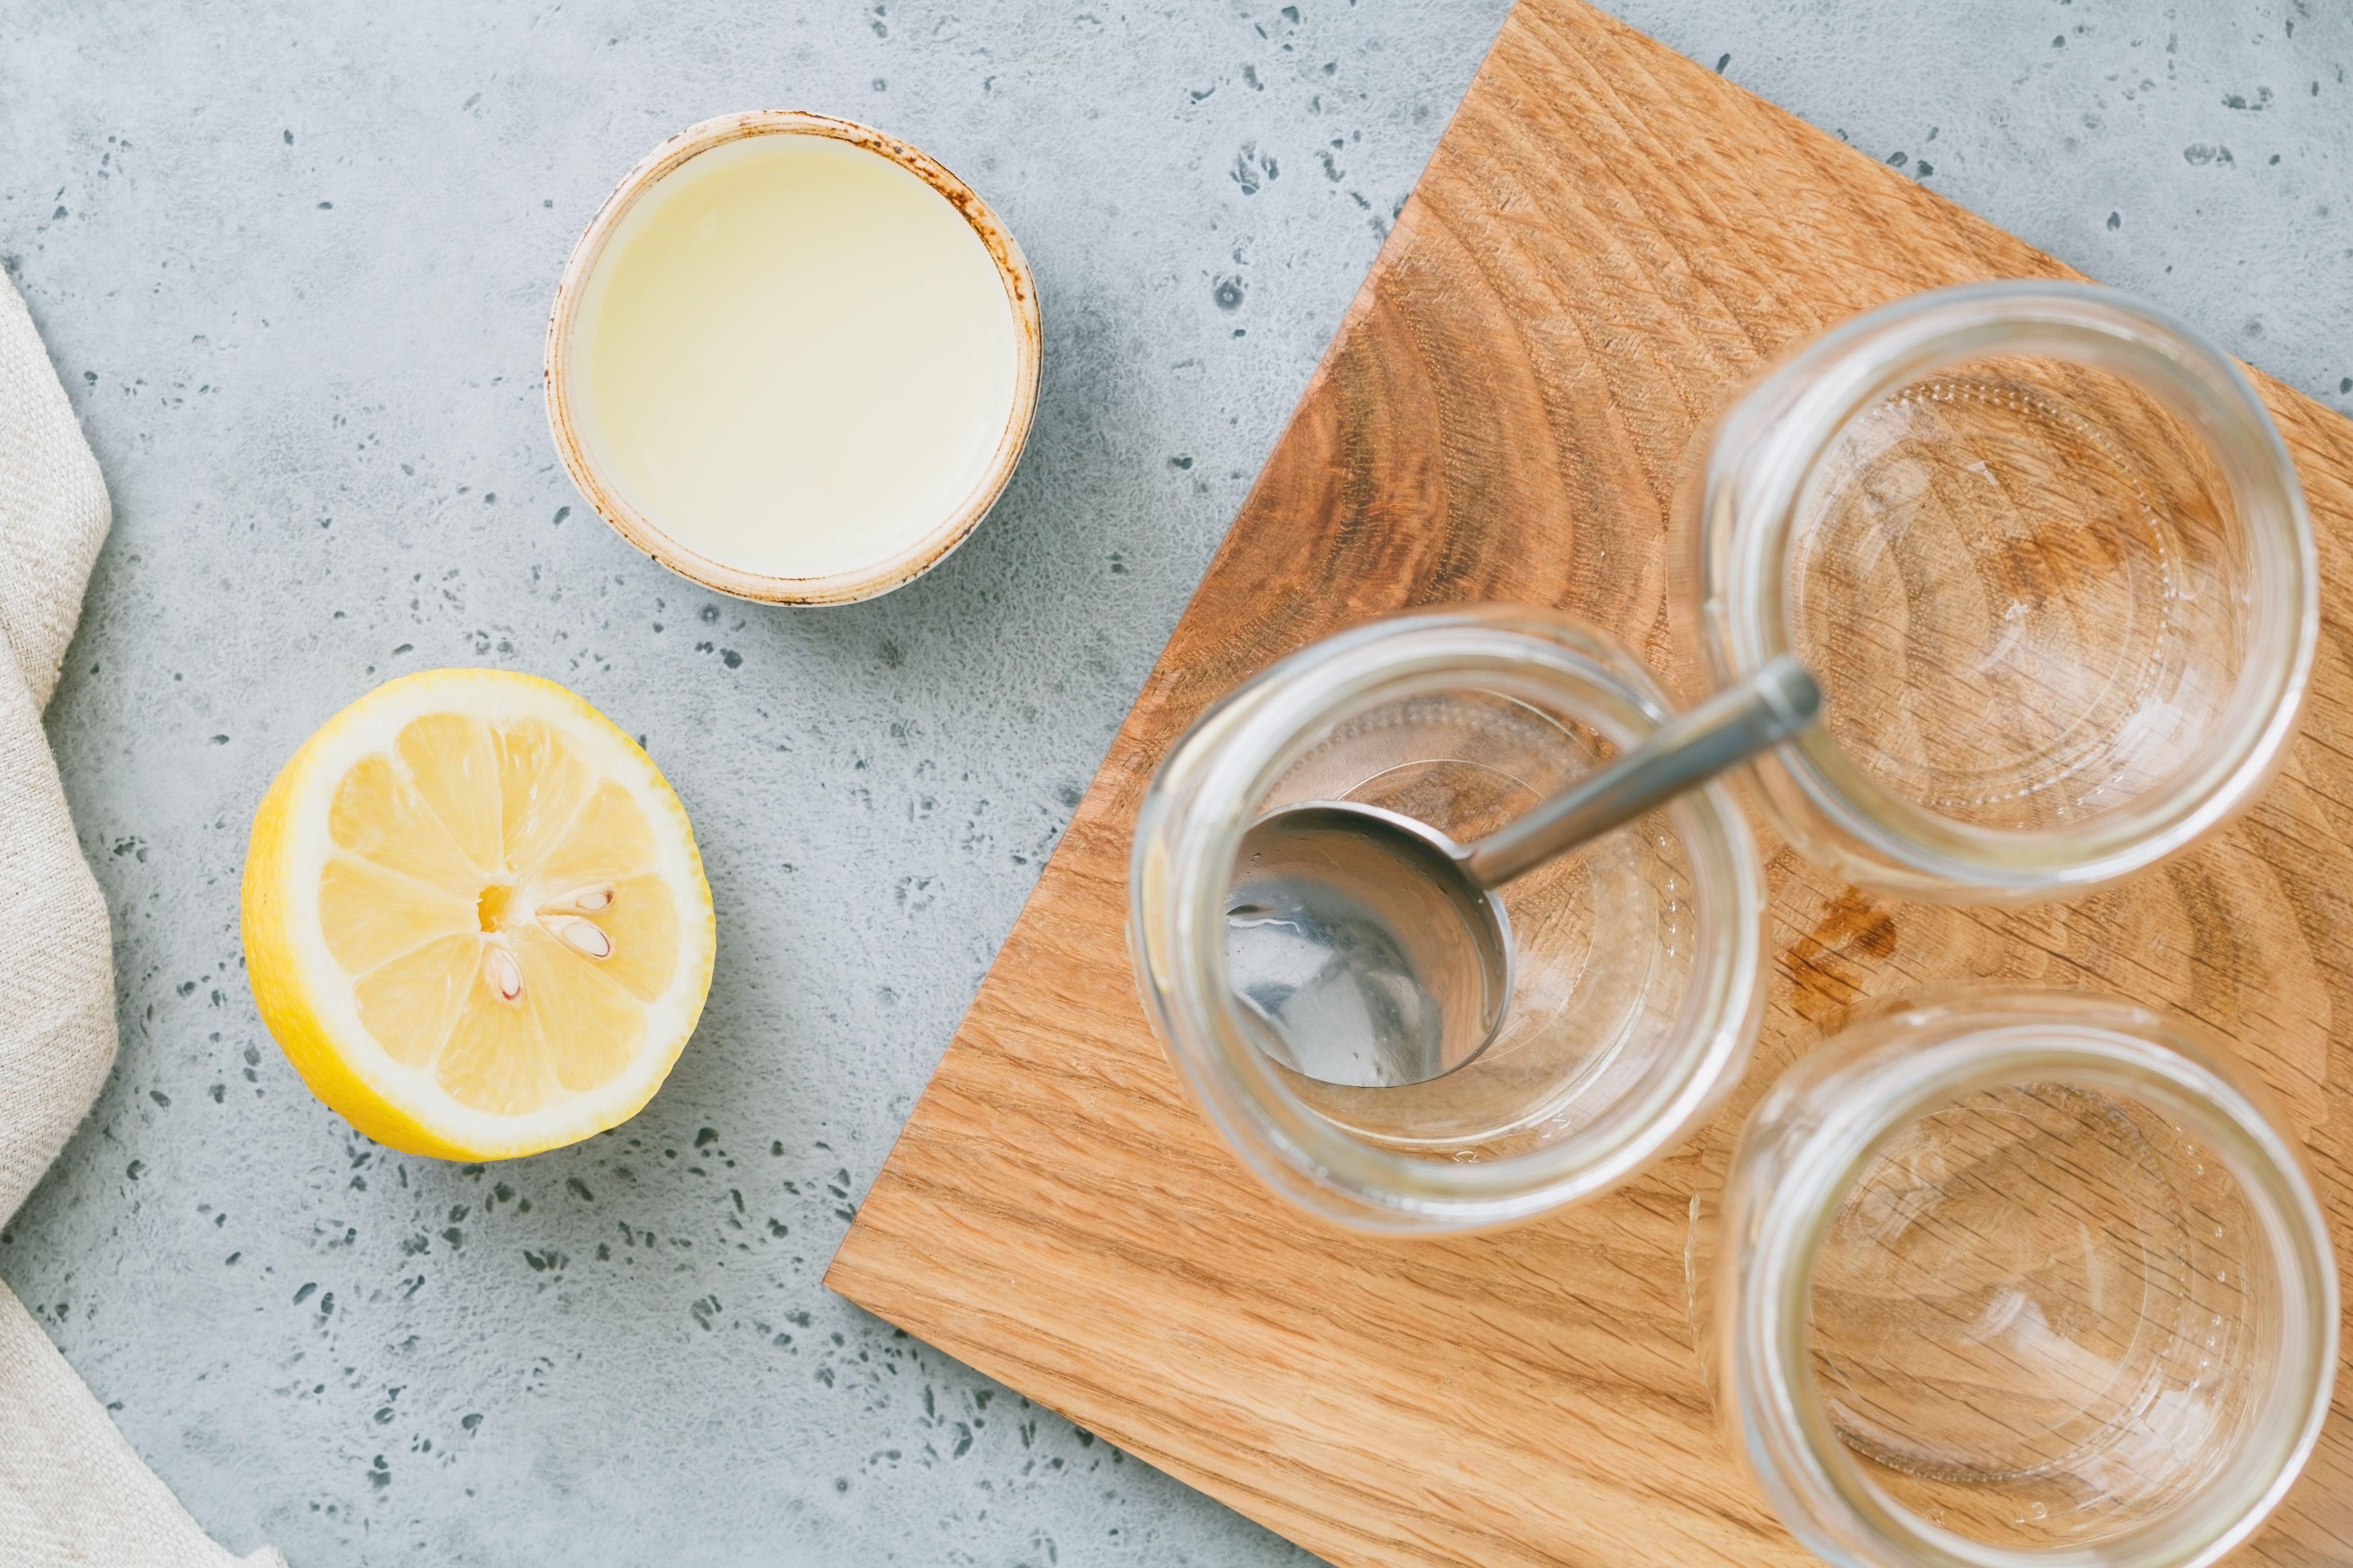 A lemon sitting next to the empty jars